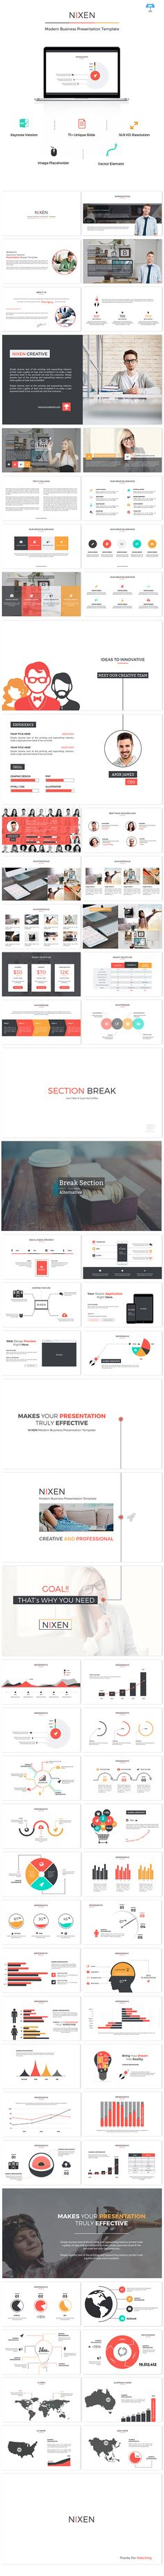 Nixen Keynote Presentation Template #design #slides Download: http://graphicriver.net/item/nixen-keynote-presentation/12334834?ref=ksioks